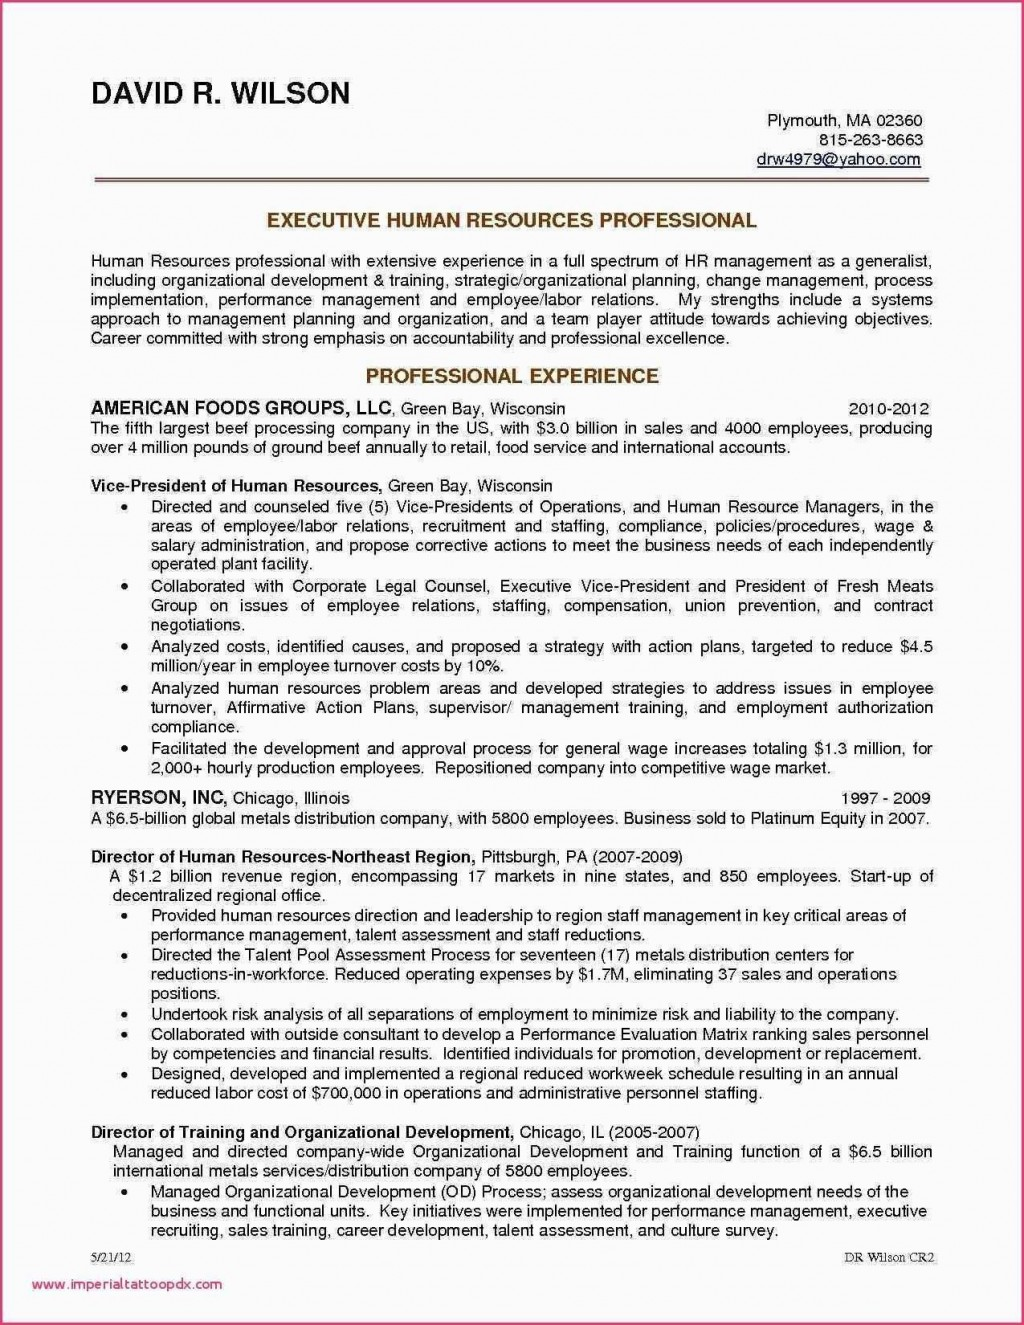 006 Sensational Professional Development Plan Template For Engineer Photo  Engineers Goal ExampleLarge